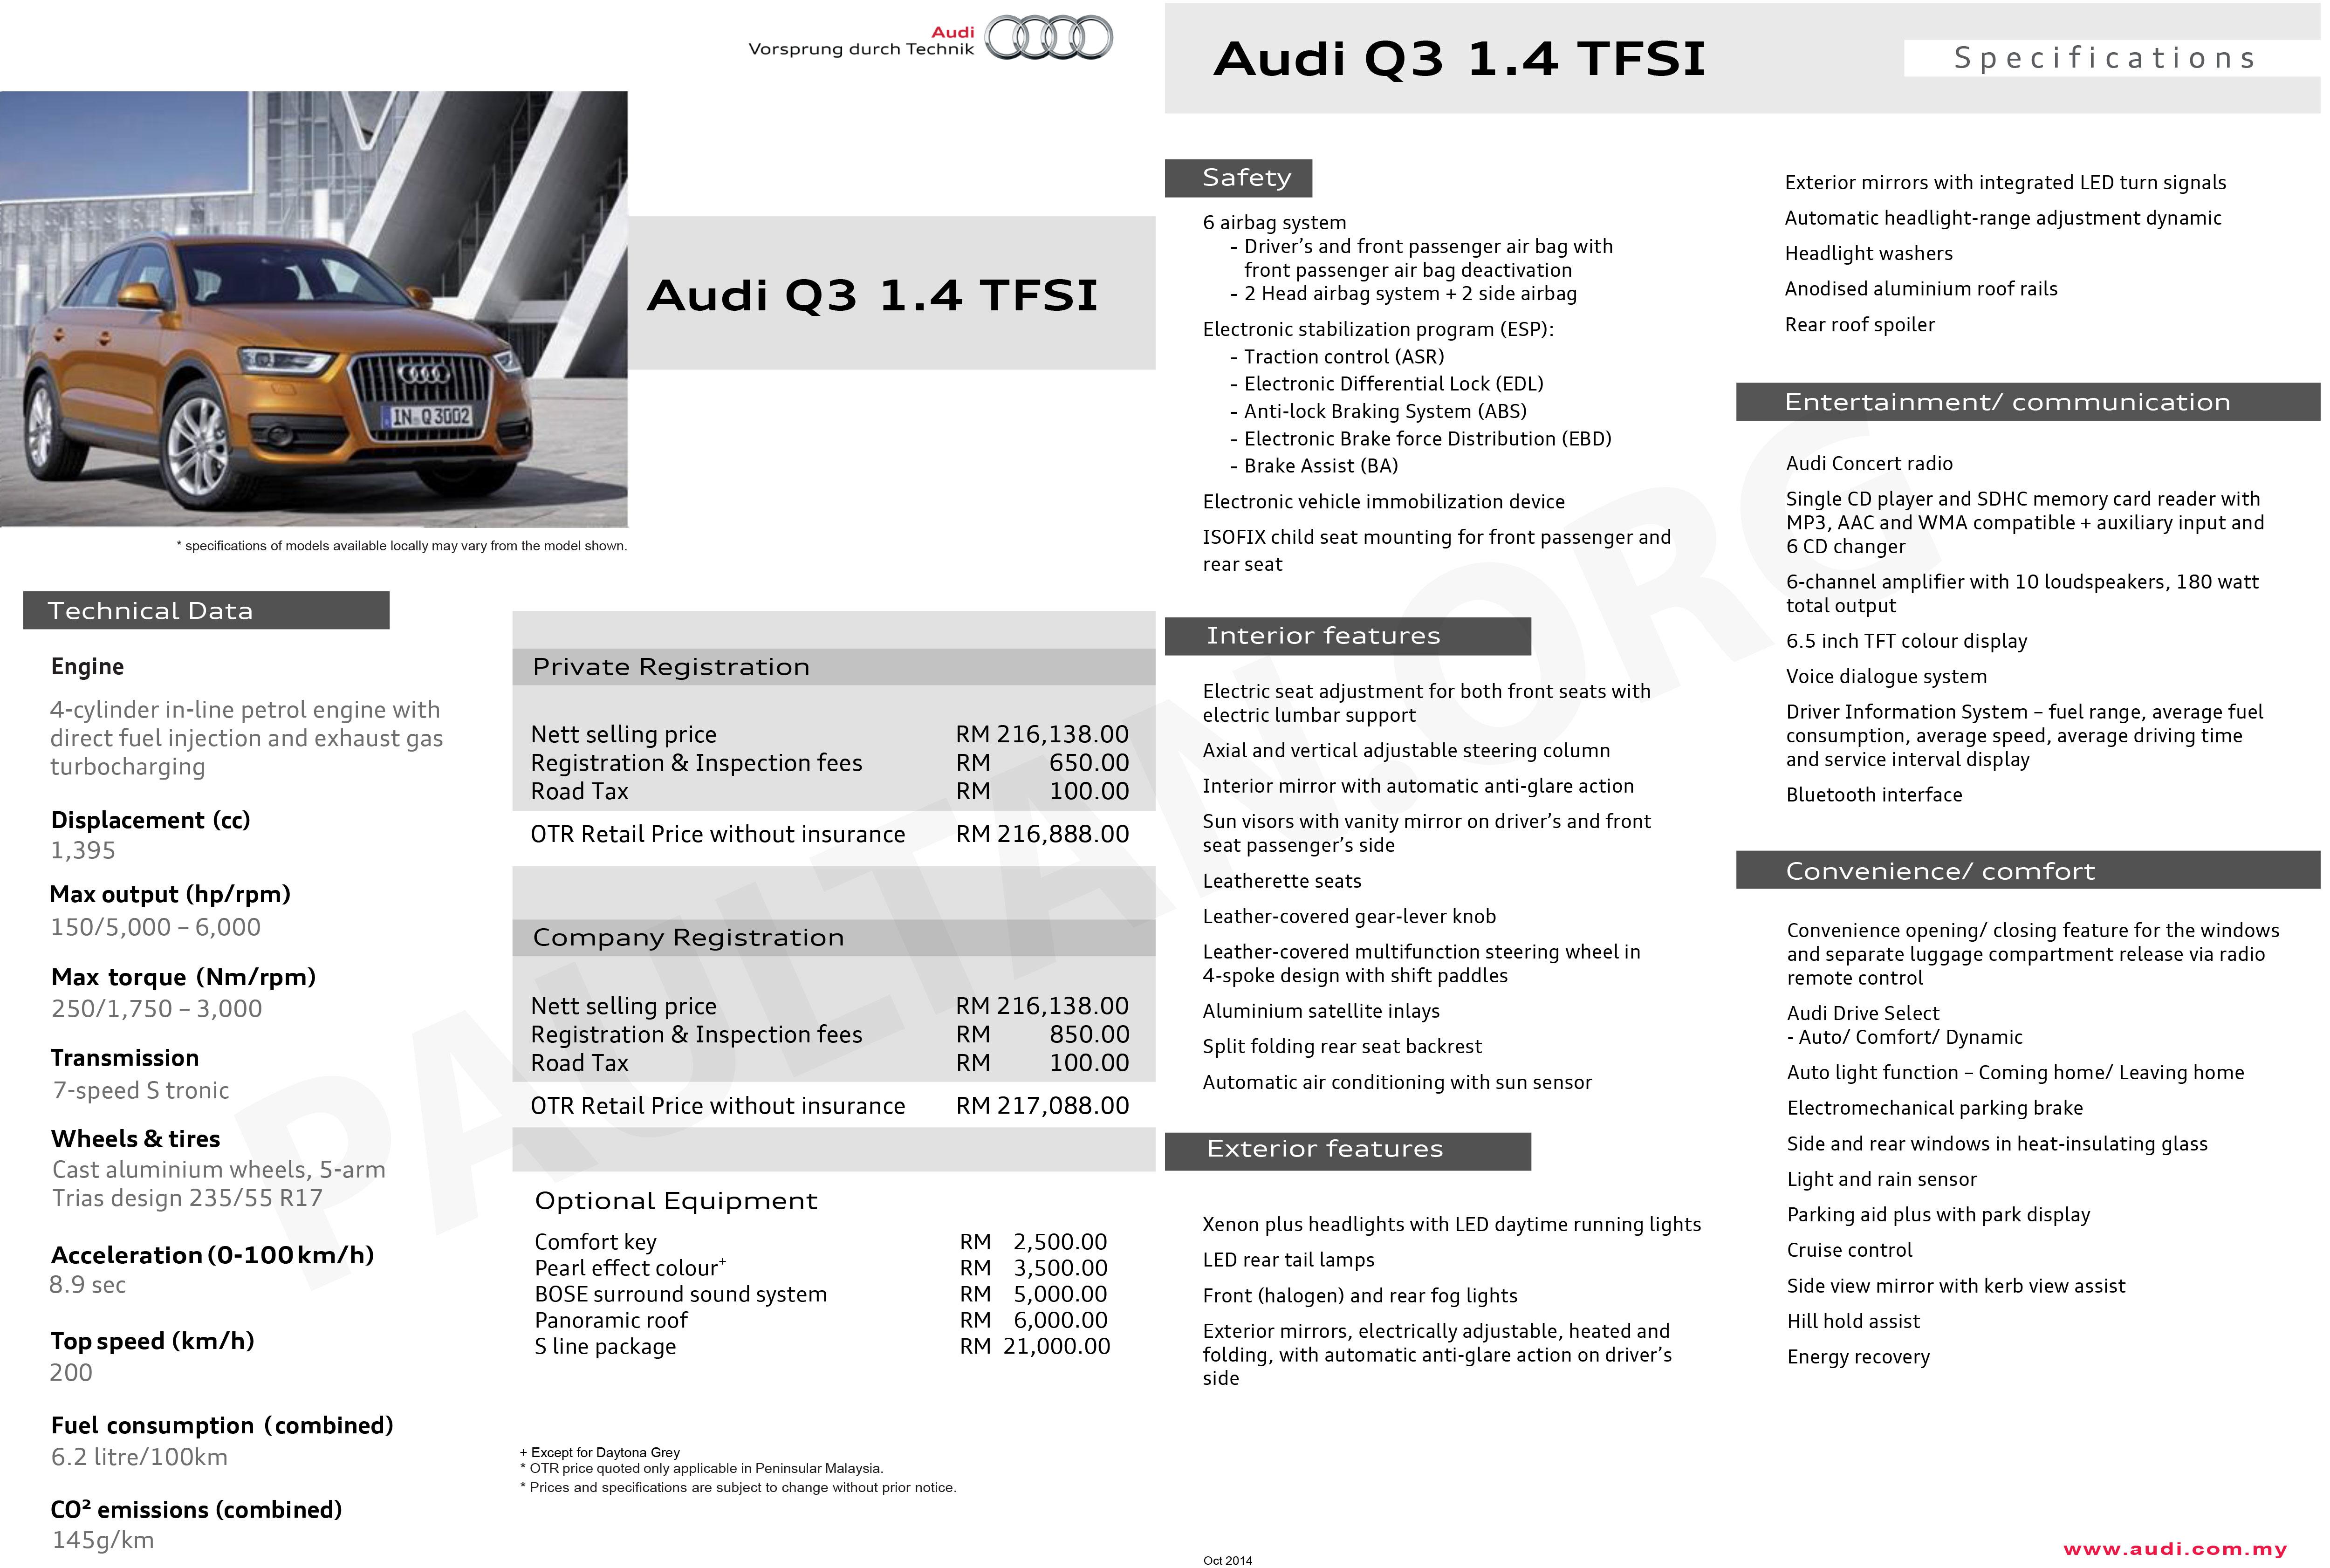 Audi Q3 1 4 Tfsi Price Specs Revealed Rm216 888 Paul